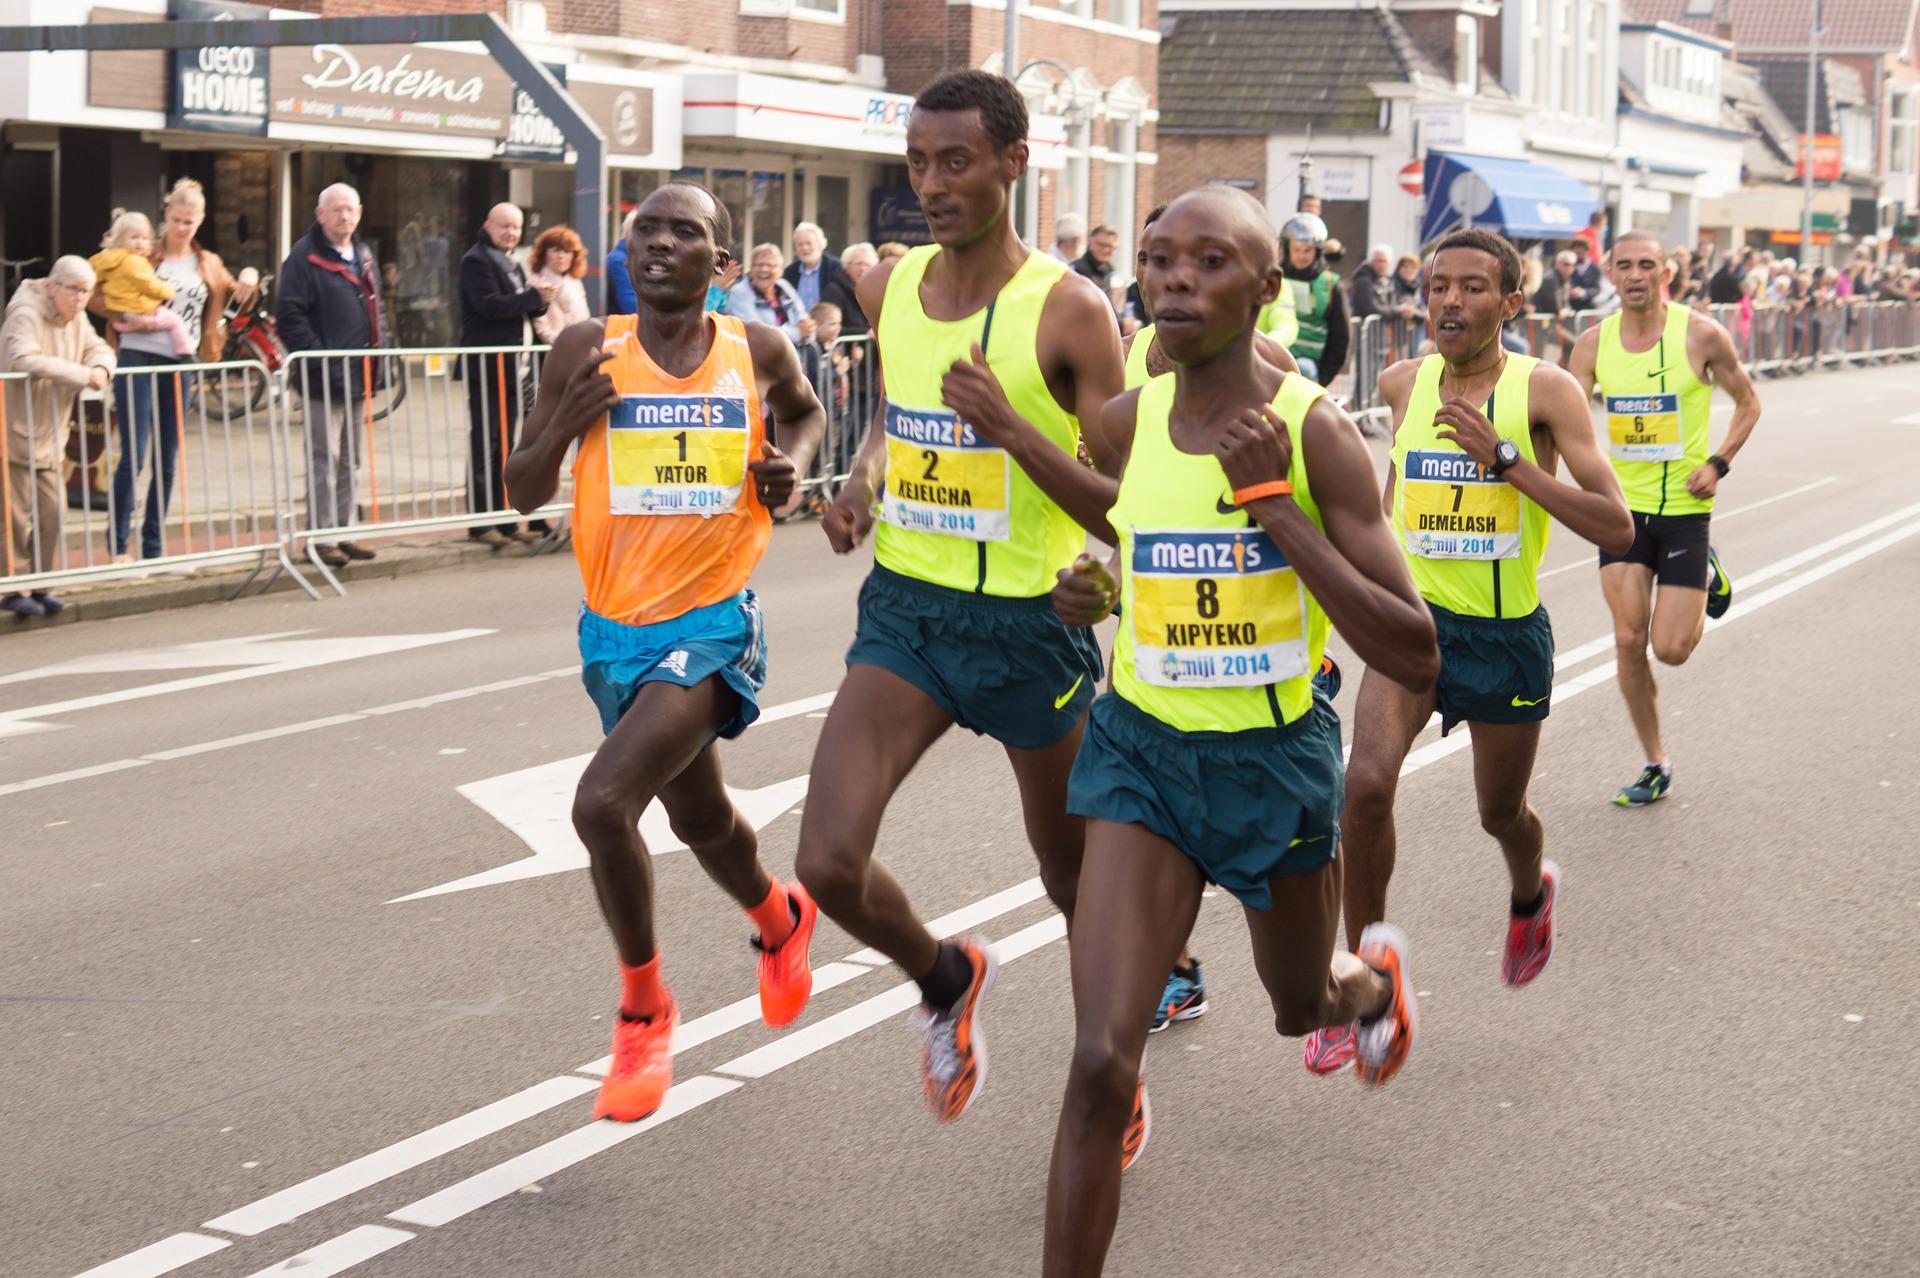 marathon-498500_1920.jpg